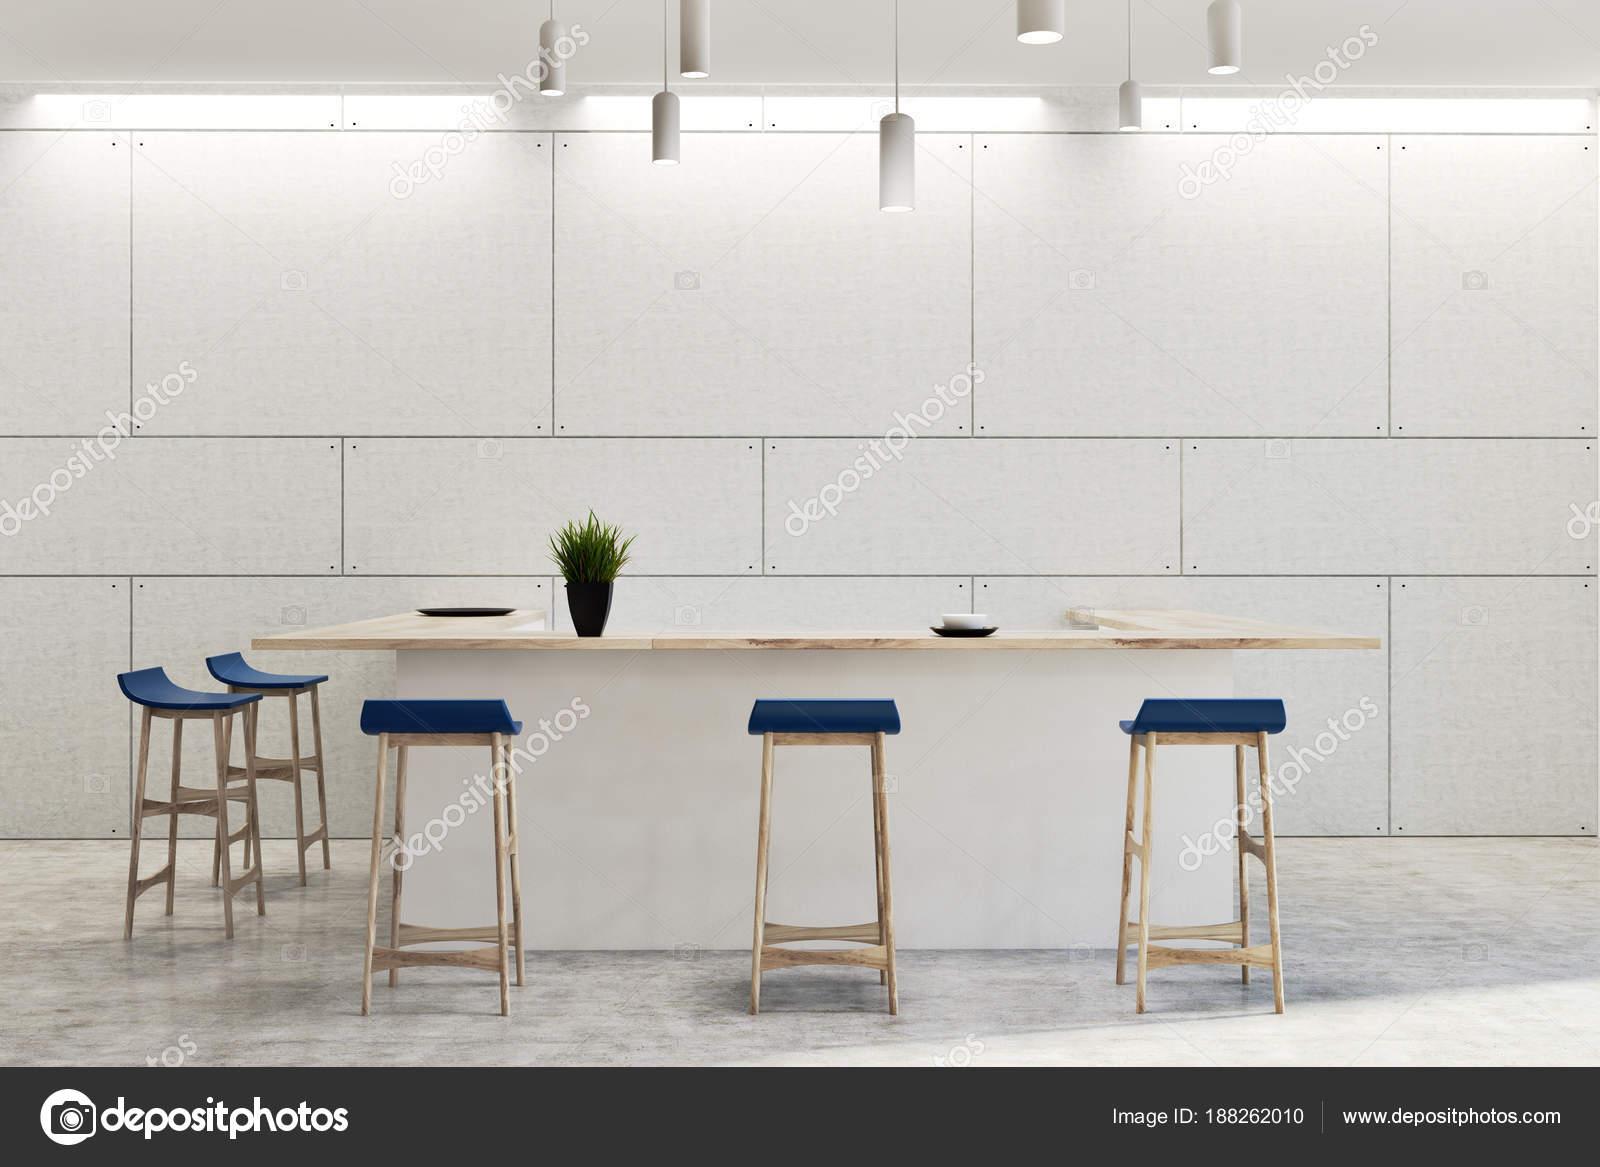 Bar sgabelli interni blu bianco moderno u foto stock